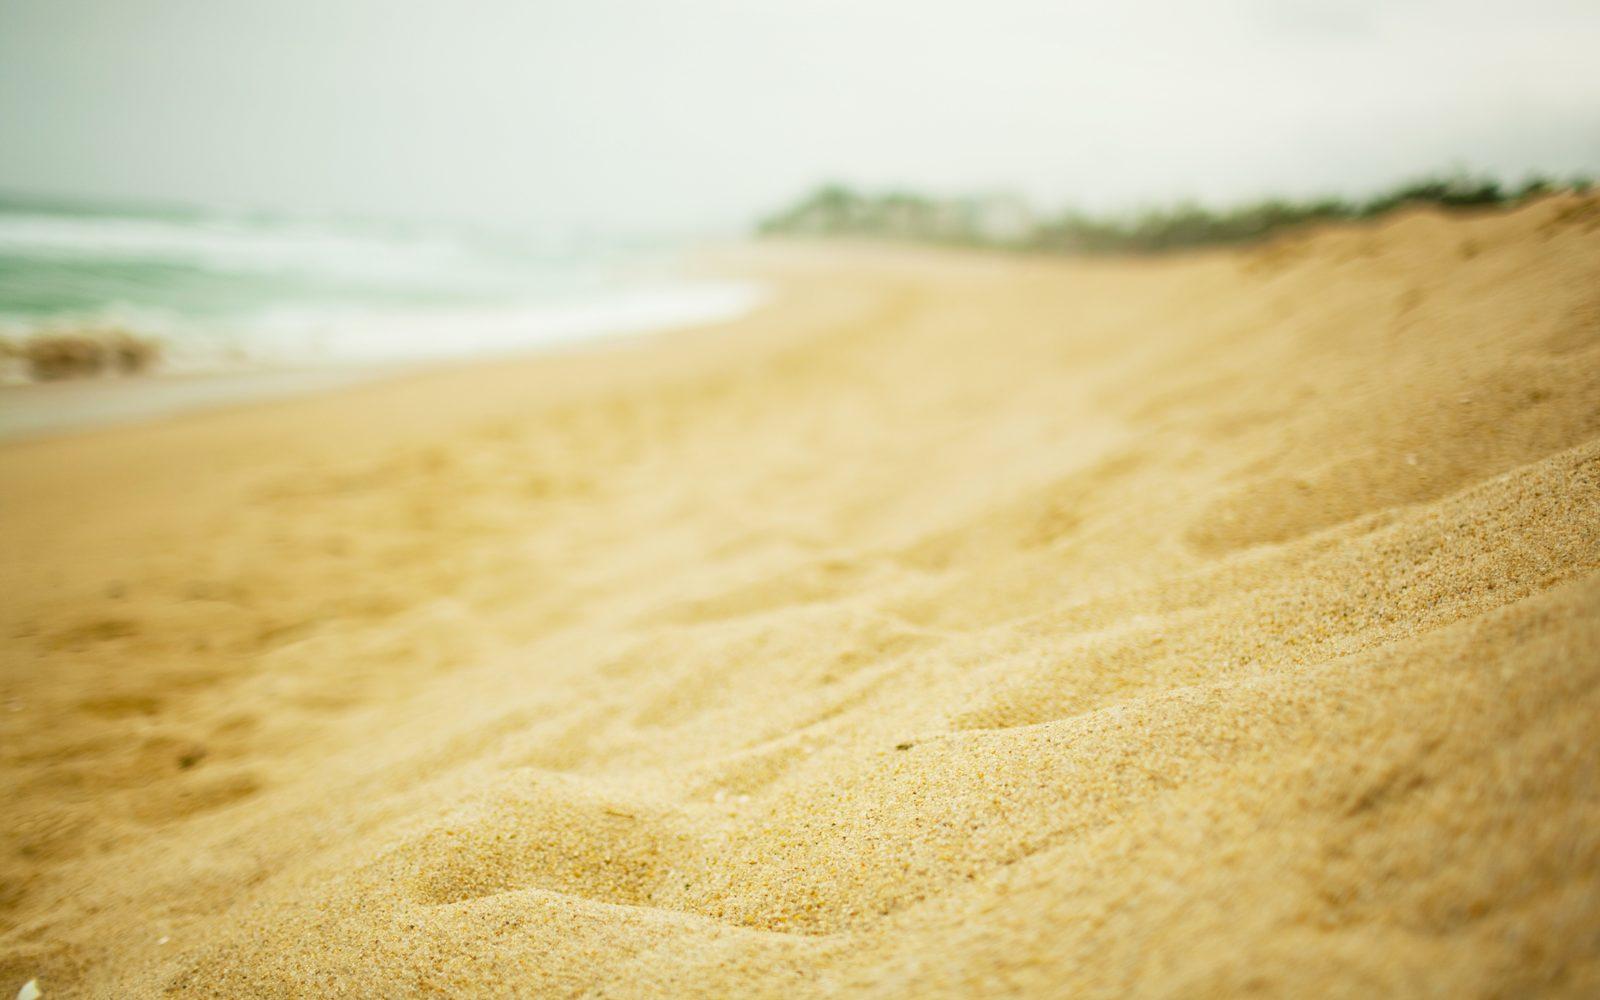 sand_particles_embankment_beach_60825_3840x2400